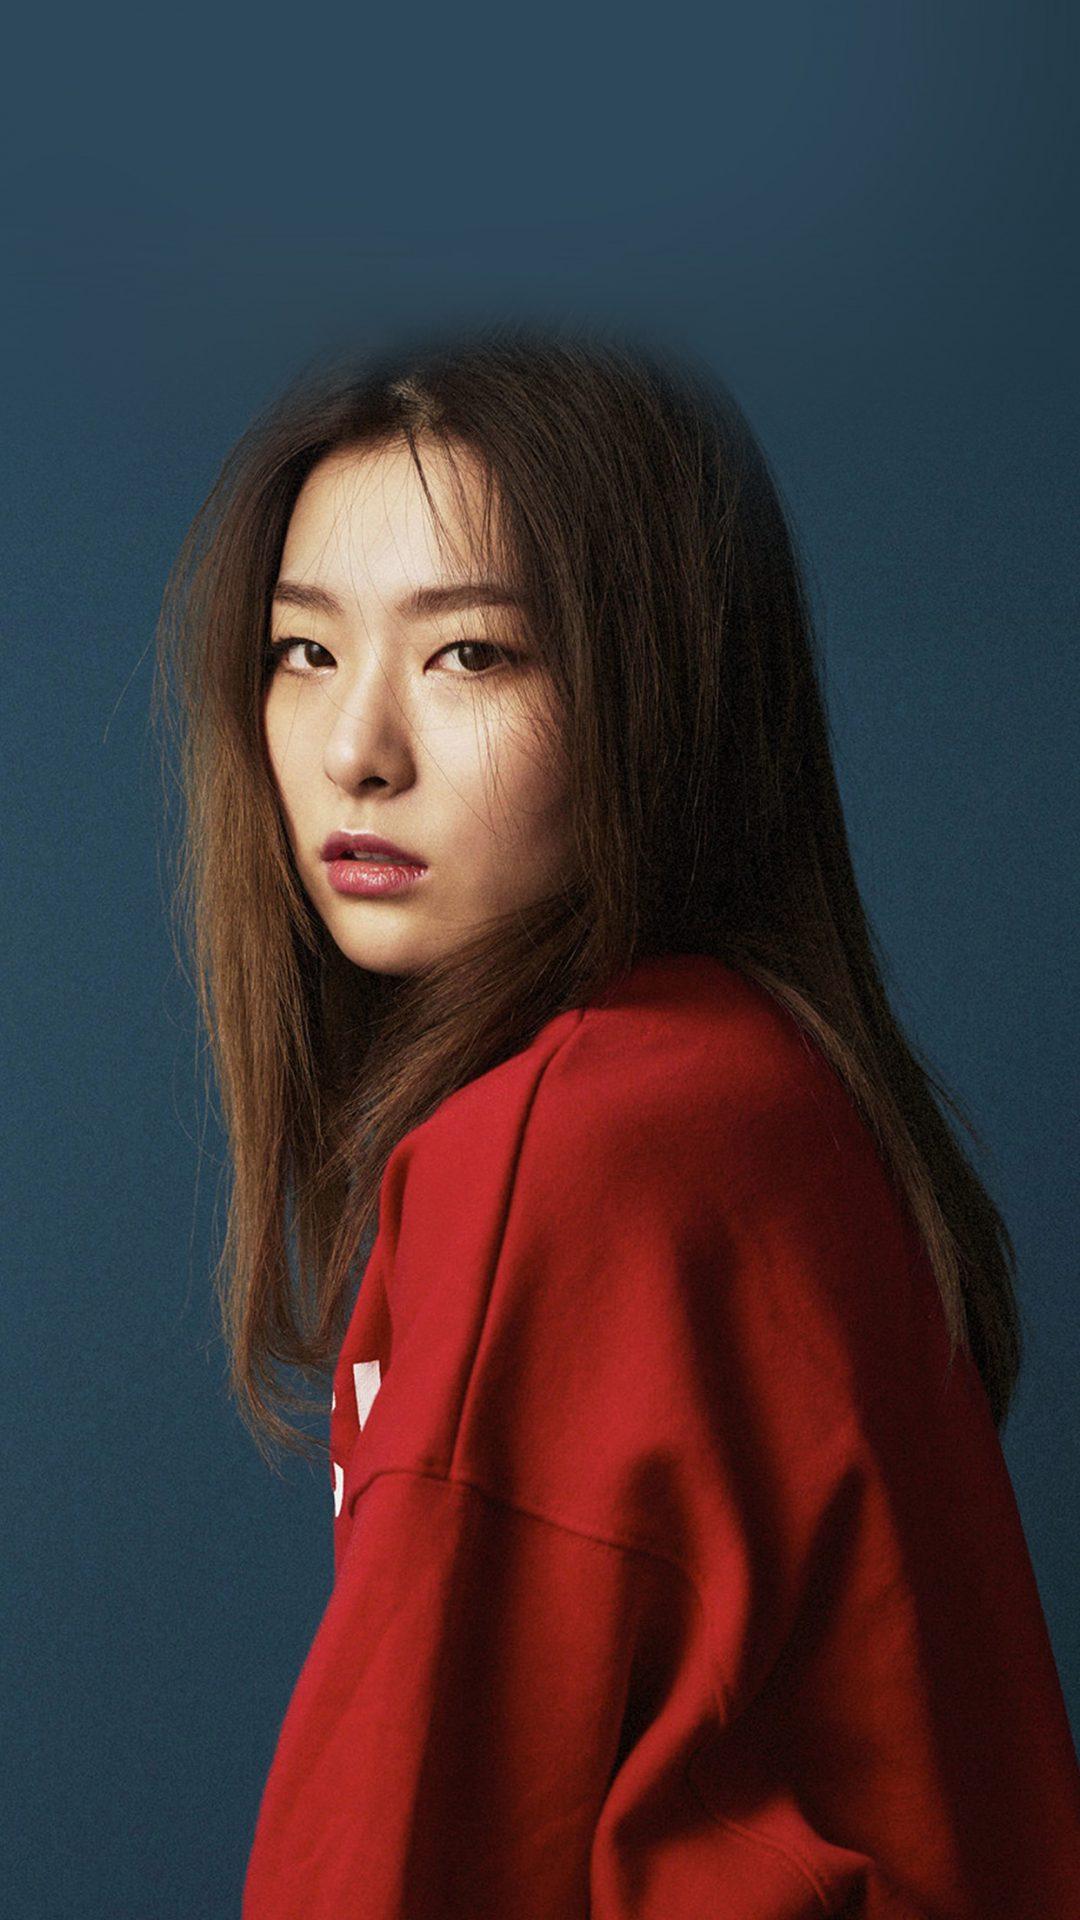 Girl Kpop Cute Red Tshirt Film